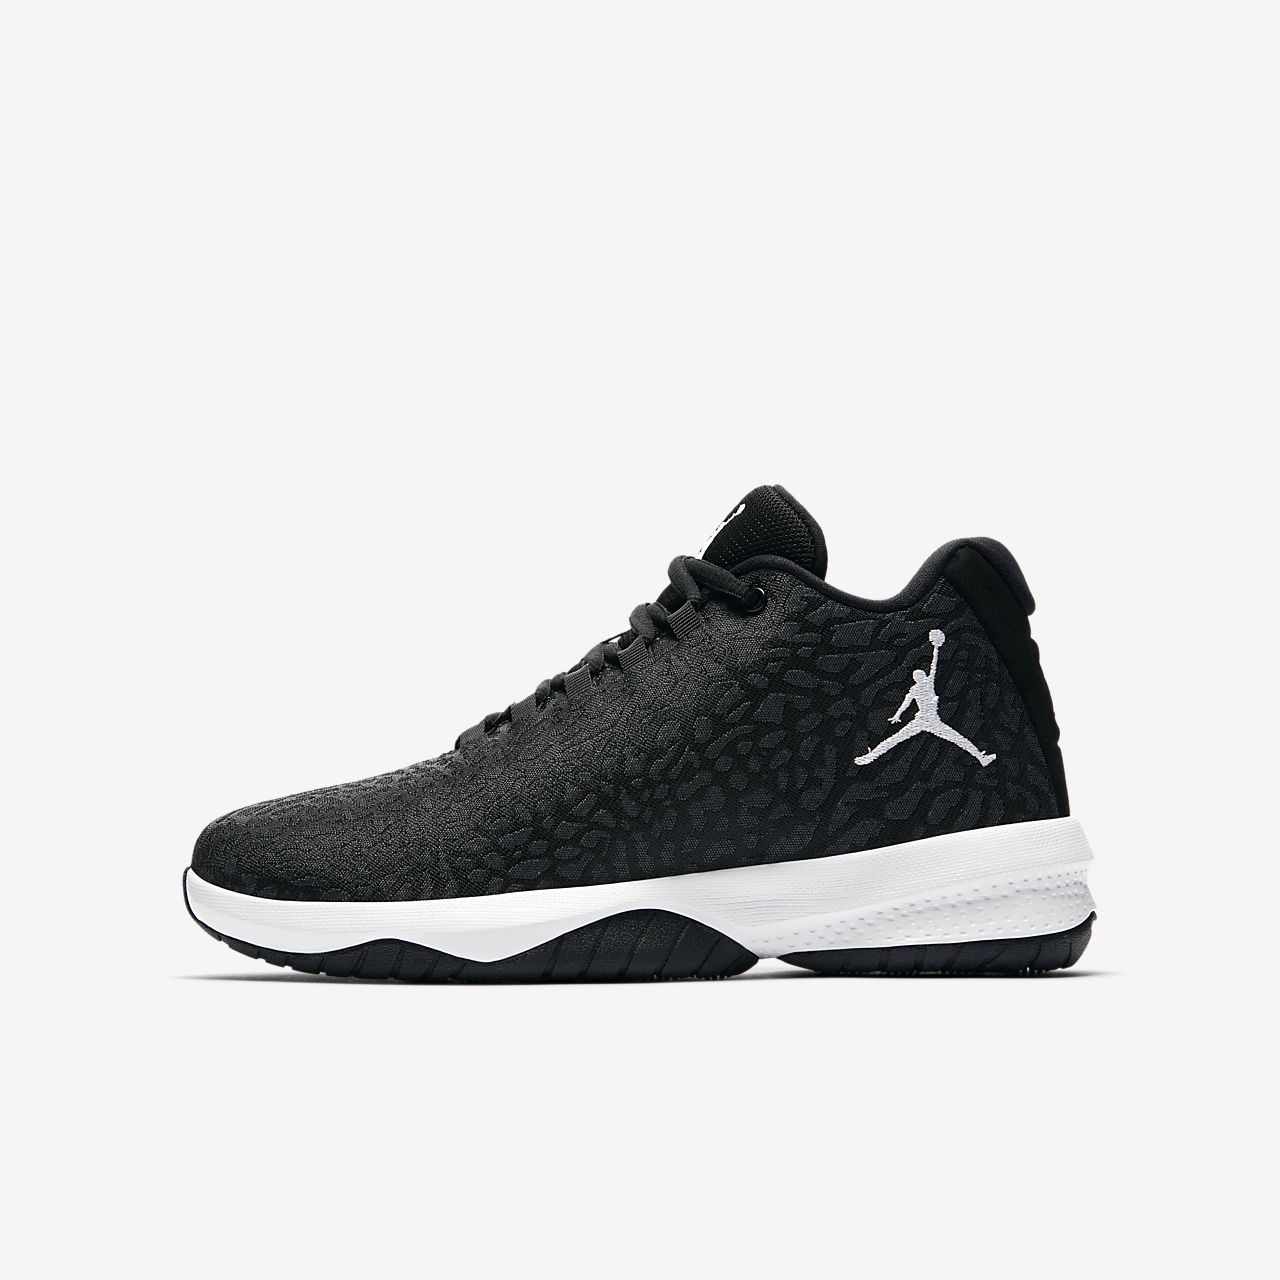 ... Jordan B. Fly Older Kids' Basketball Shoe